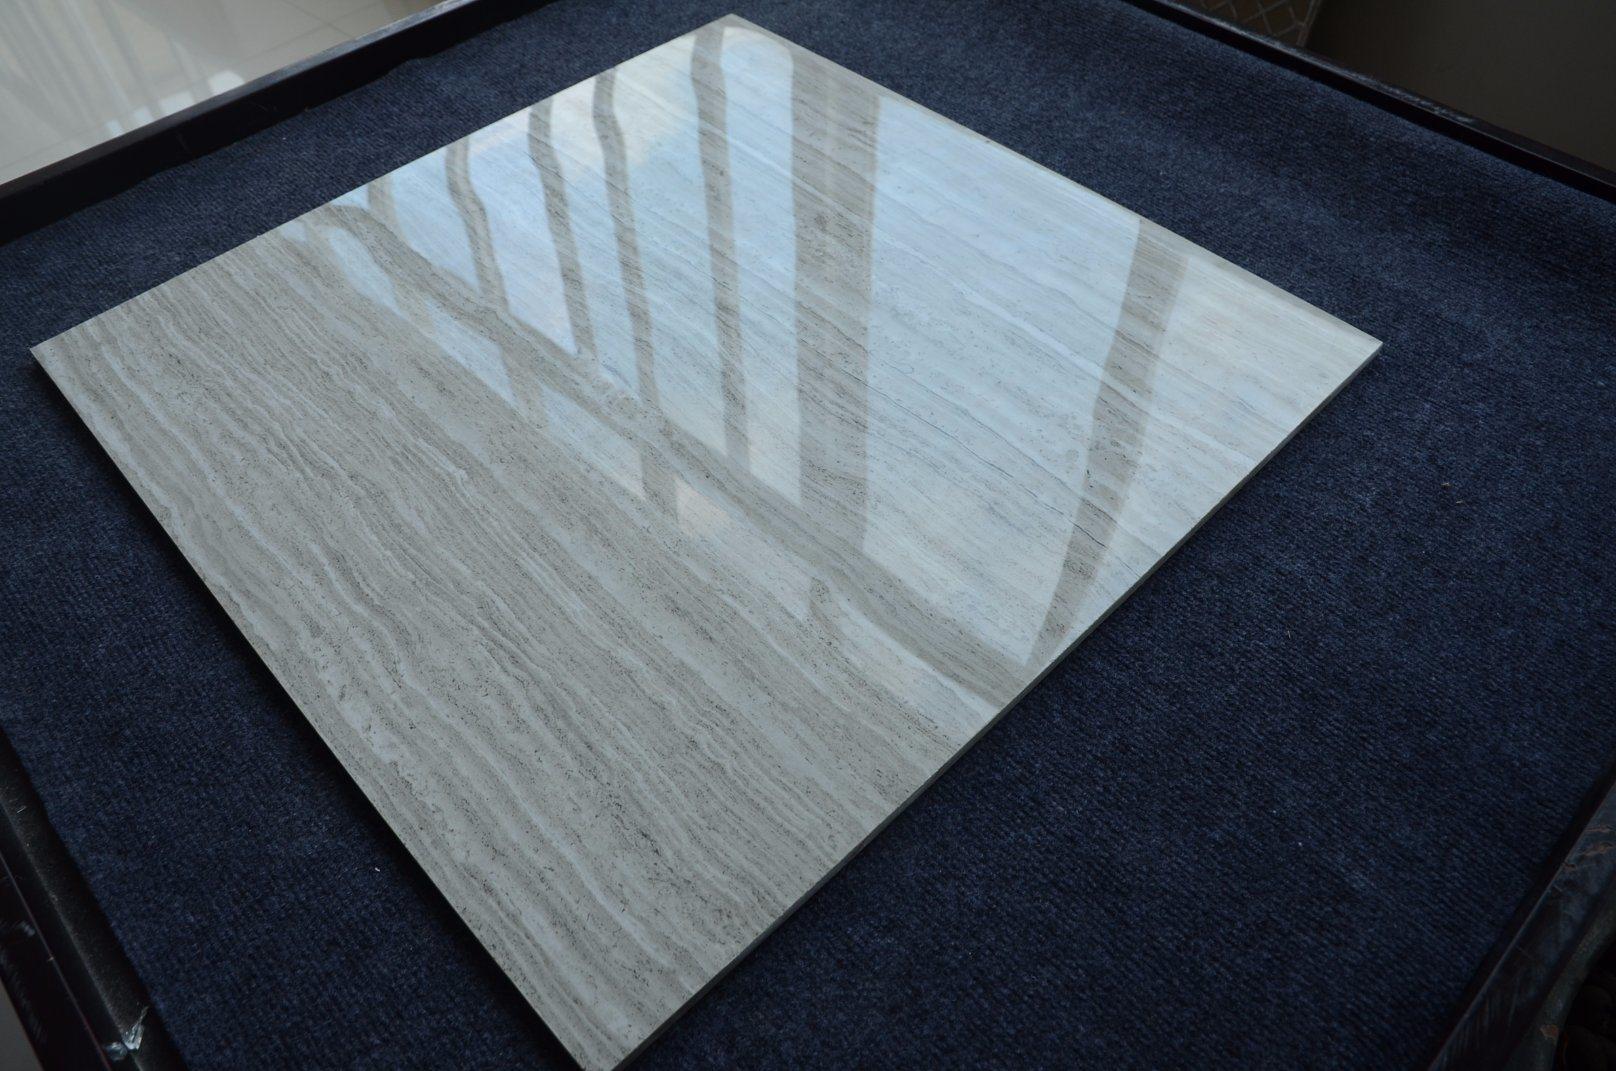 China 800X800 Travertine Flooring Stone Bathroom Turkish Marble Tile ...